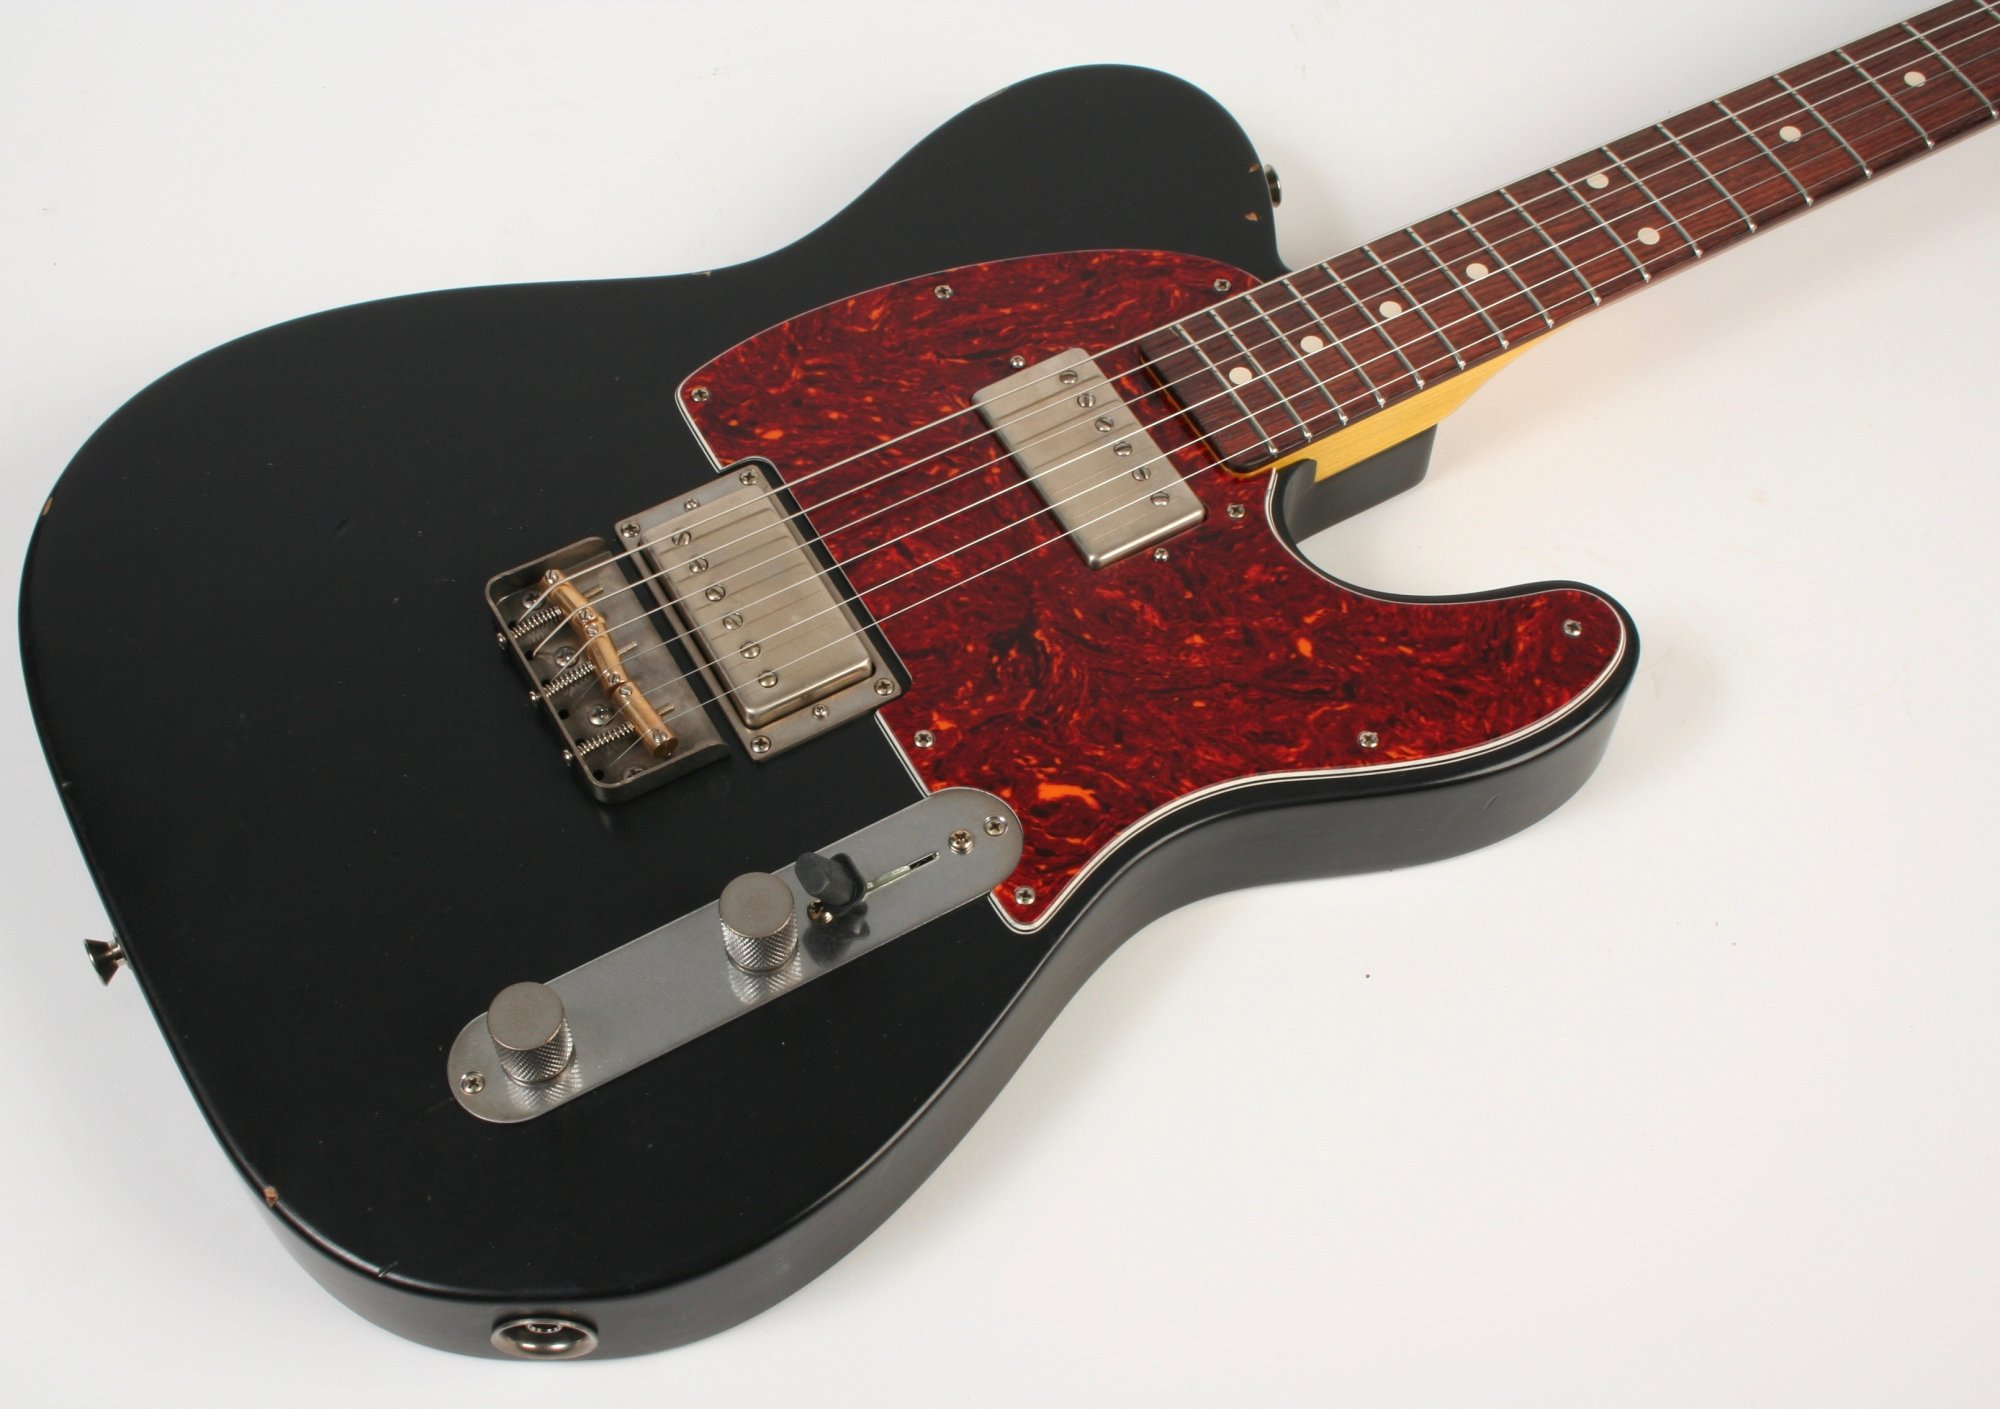 Nash Guitars T-2HB Black Lollar Imperial Humbuckers